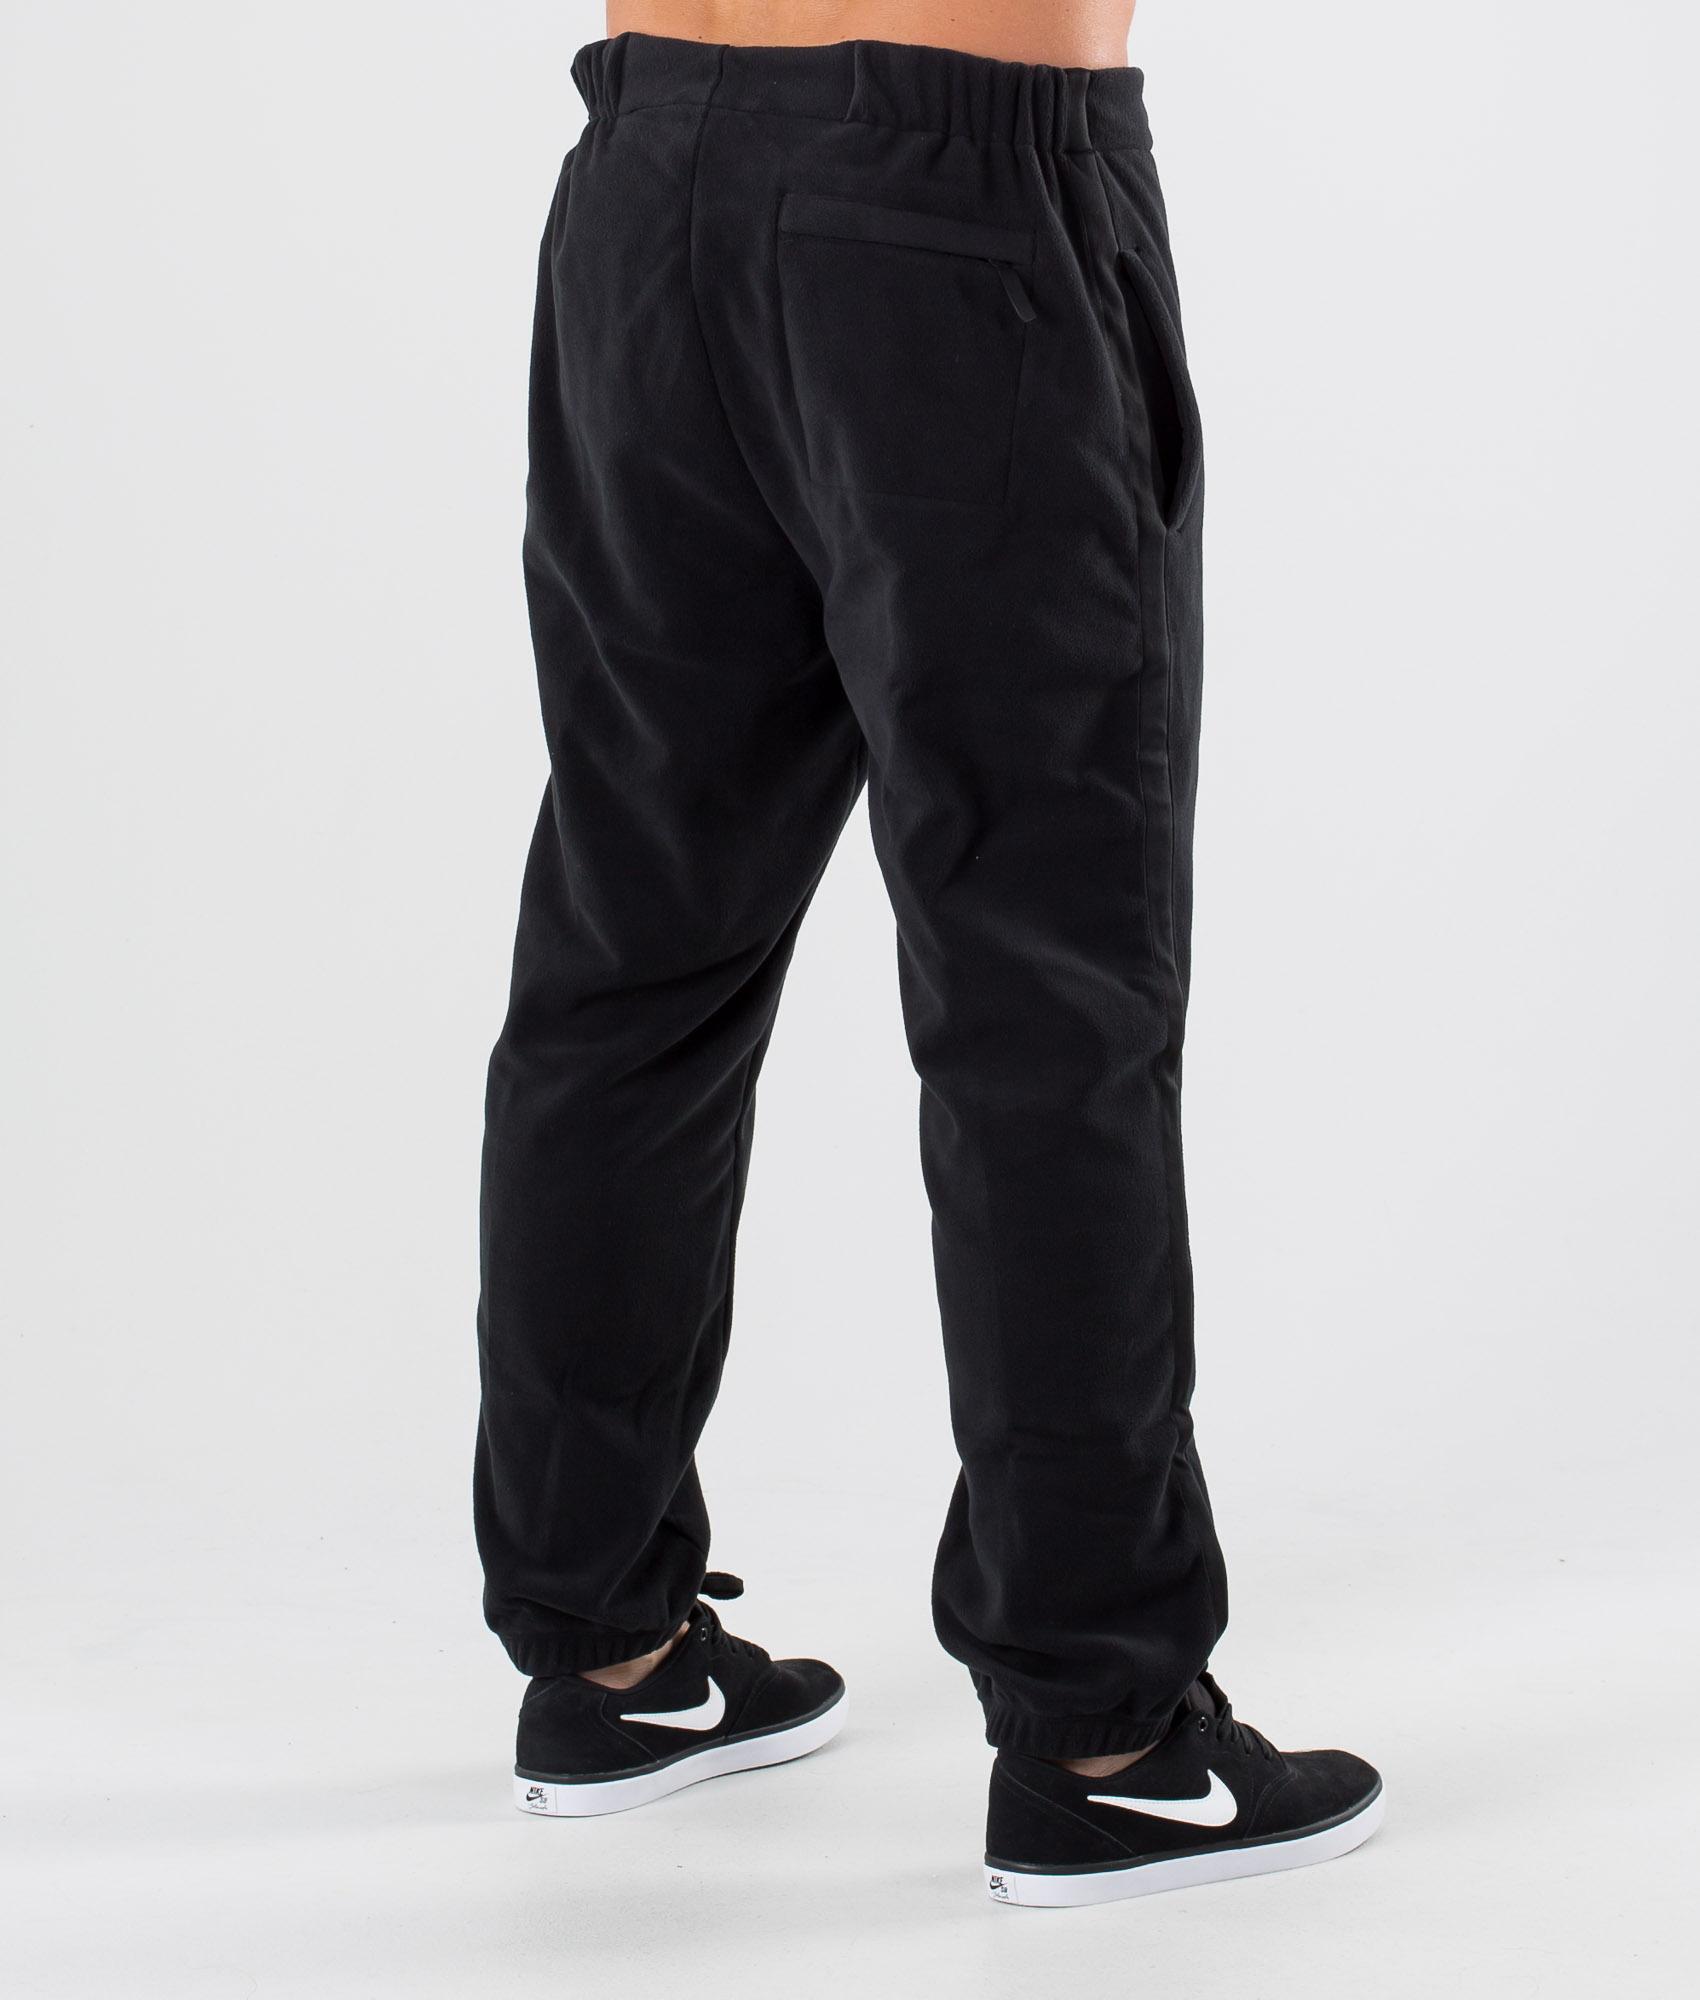 Nike | SB Novelty Fleece de chez Pantalon BlackSail